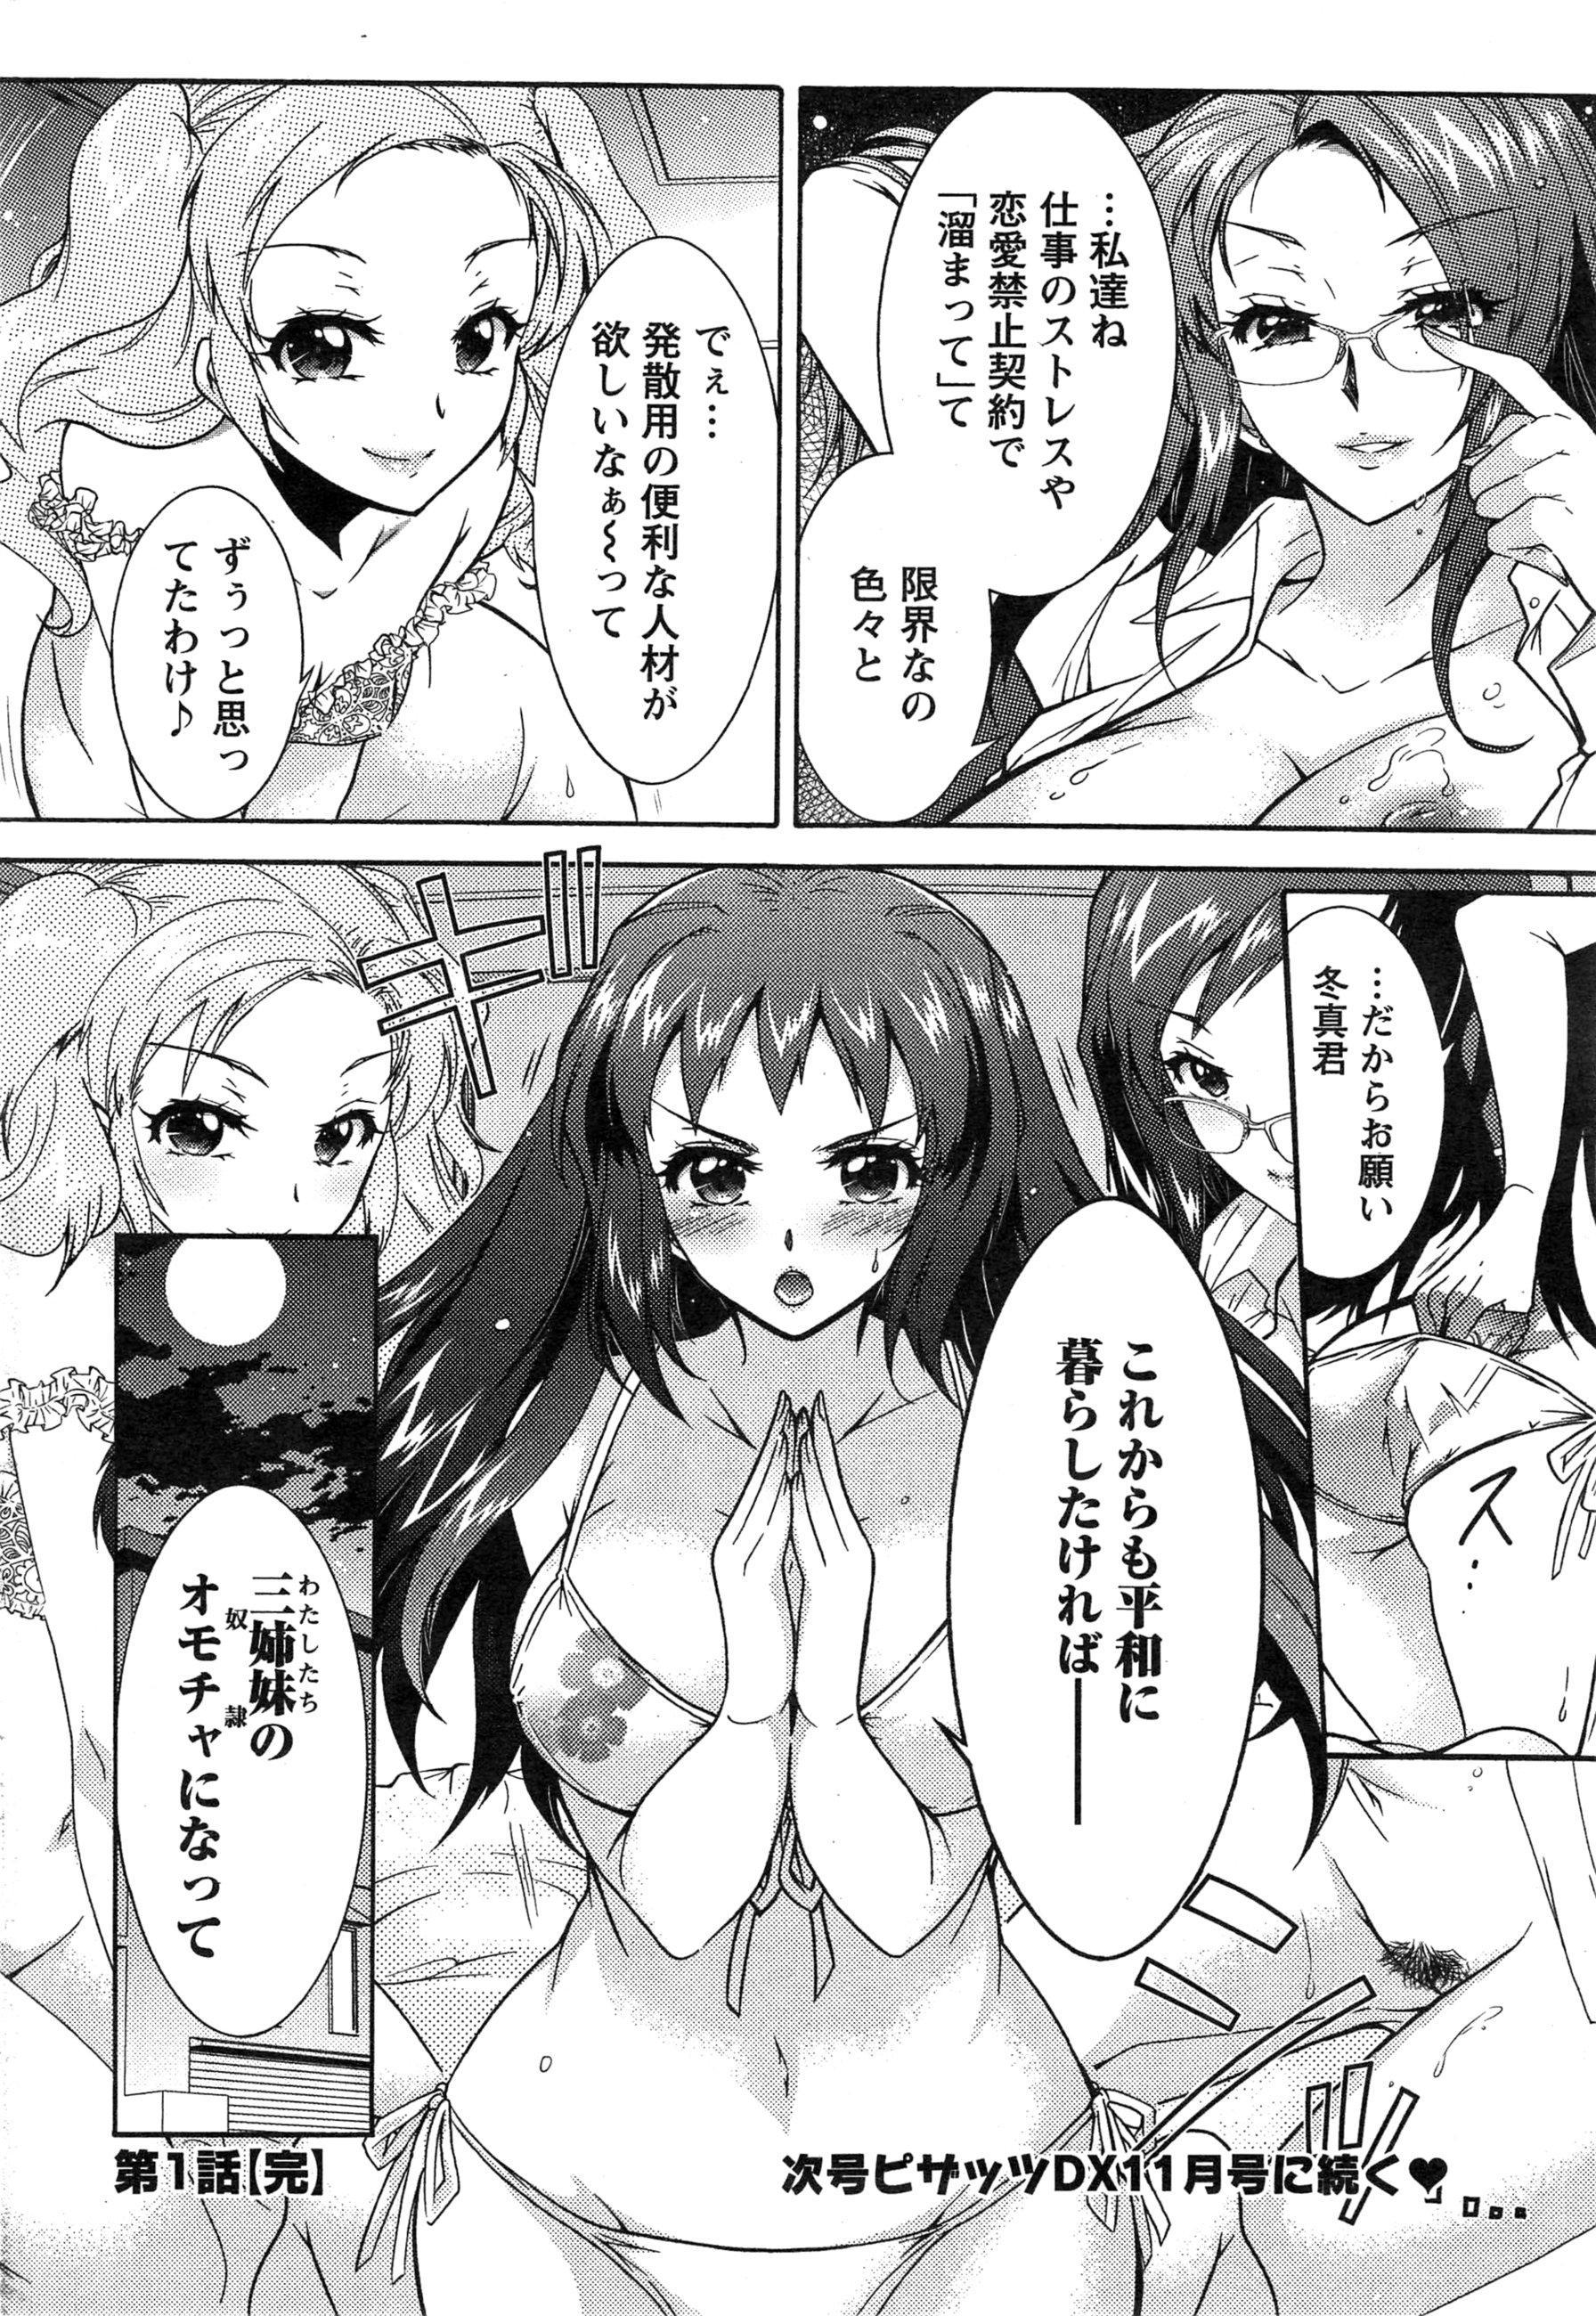 [Honda Arima] Sanshimai no Omocha - The Slave of Three Sisters Ch. 1-6 20